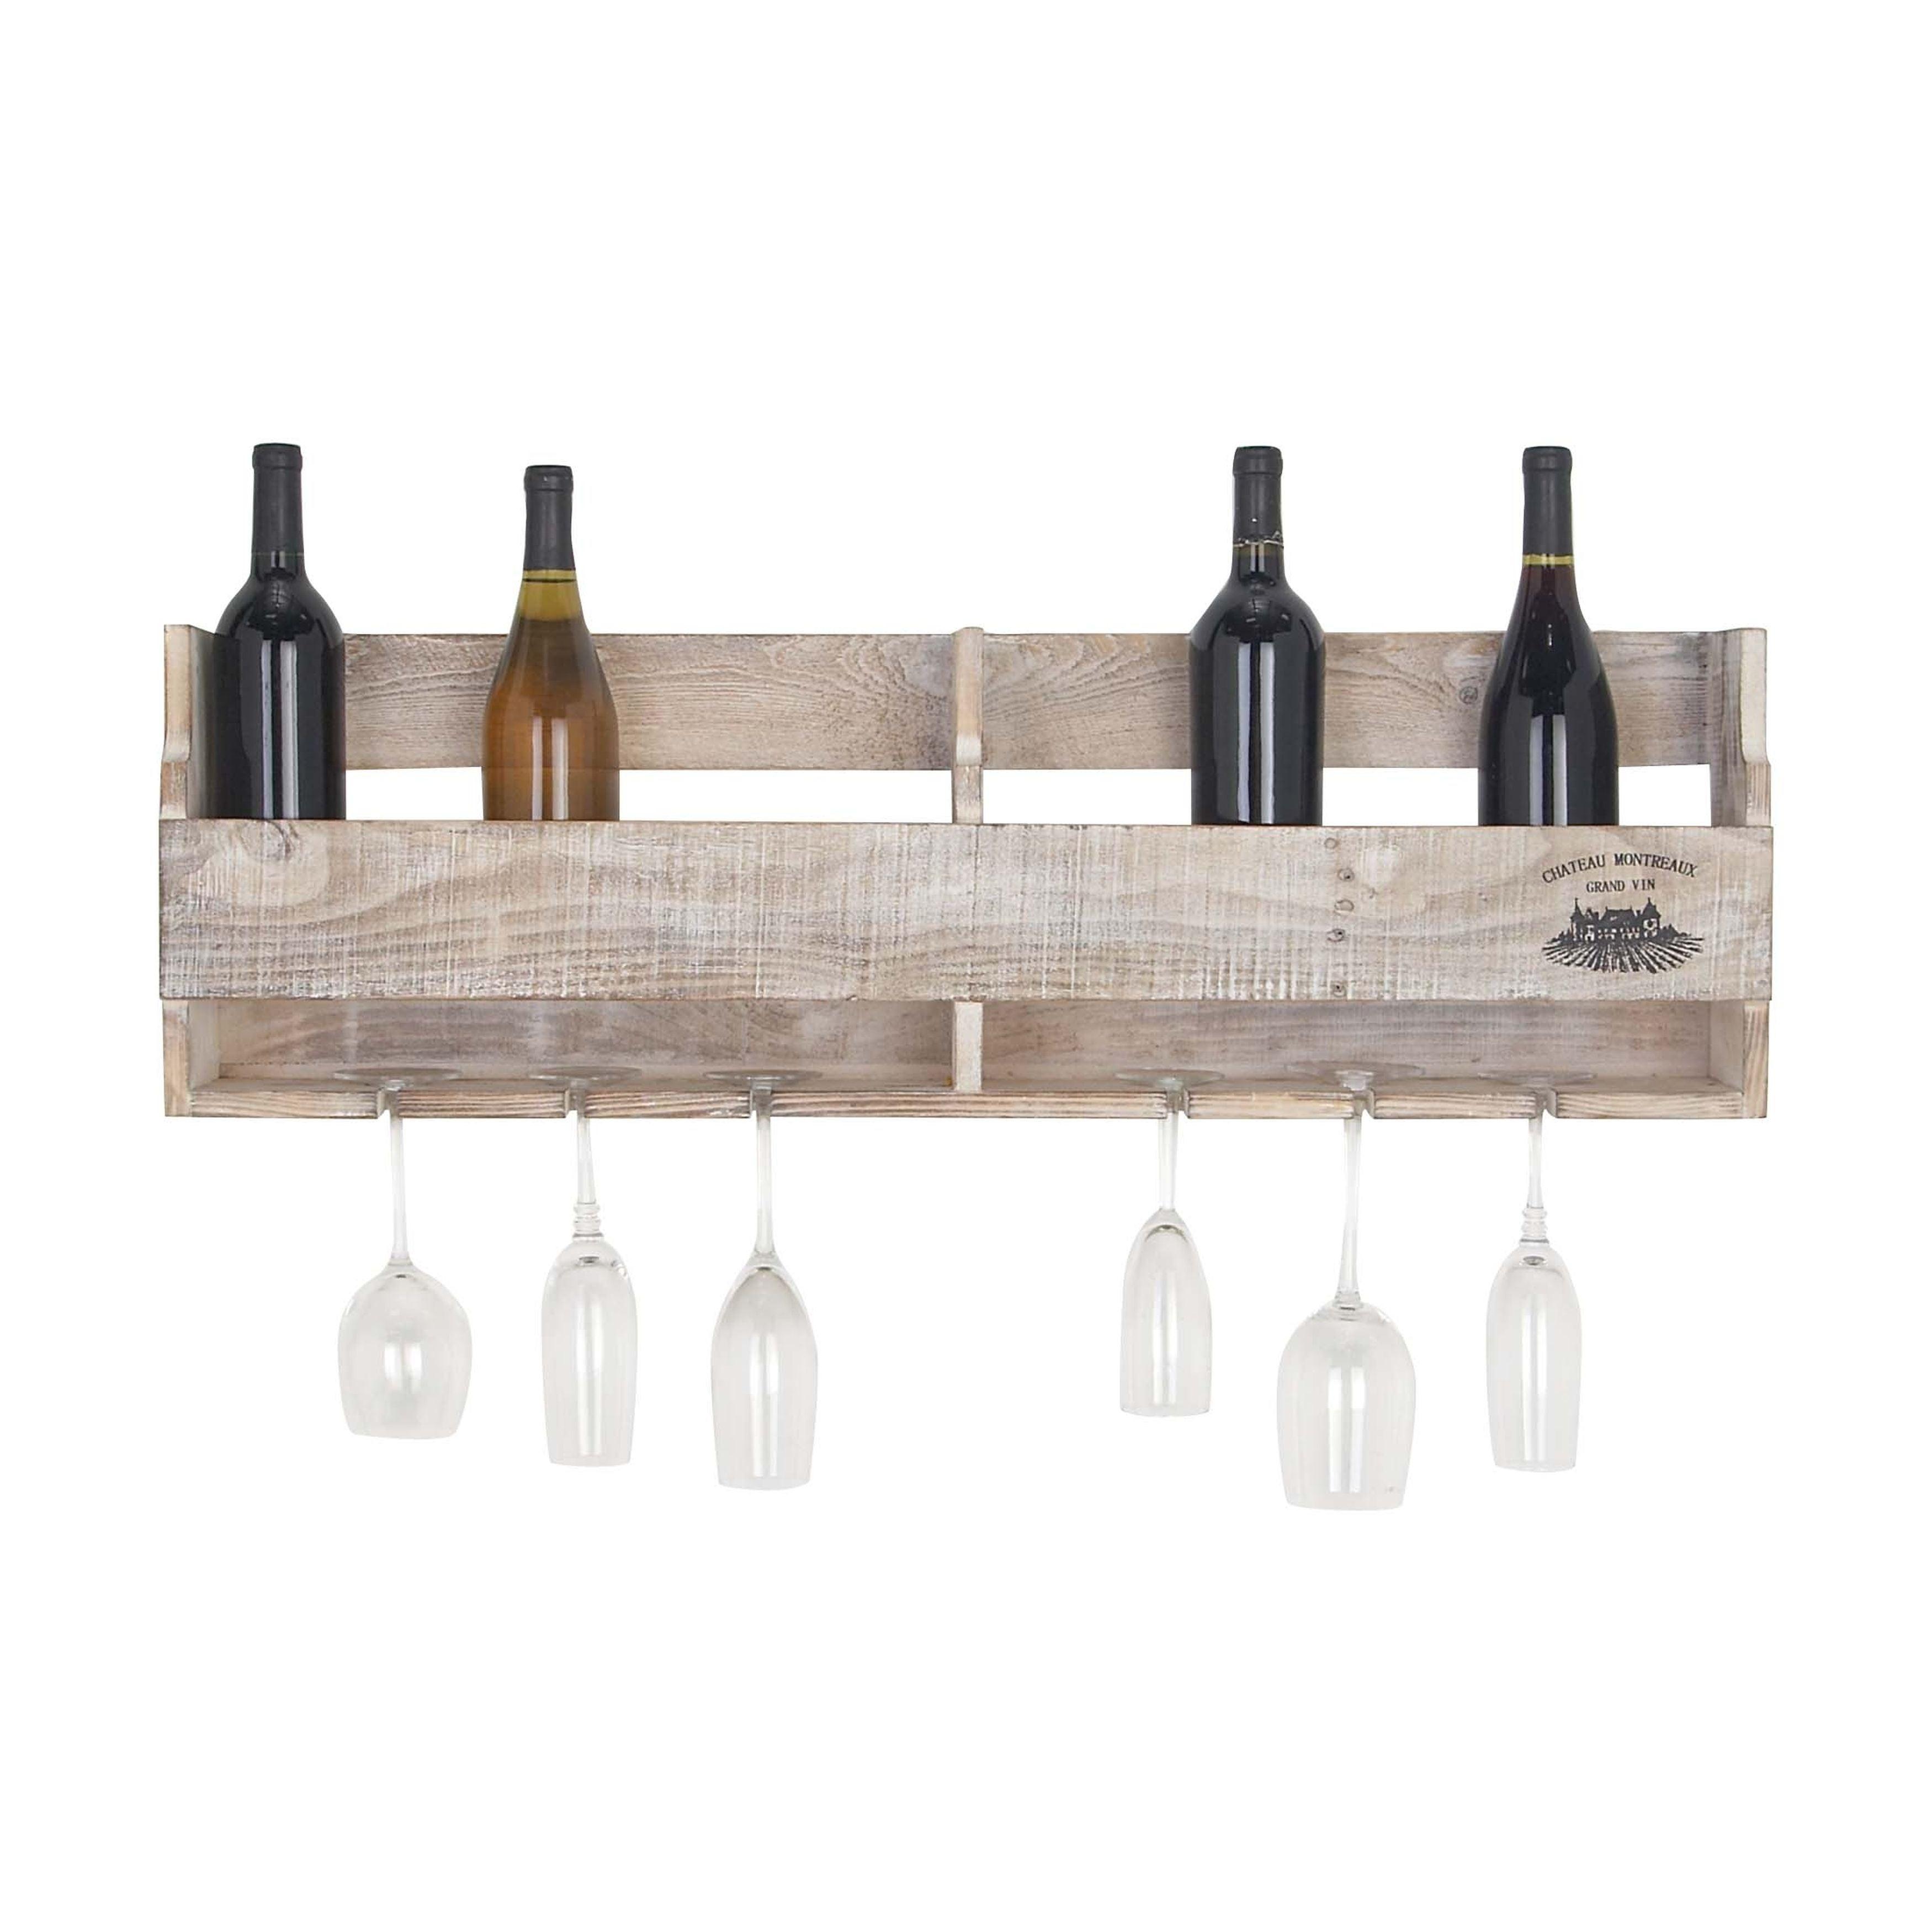 Multi Bottle Glass Wine Holder Wall Mounted Wooden Shelf Kitchen